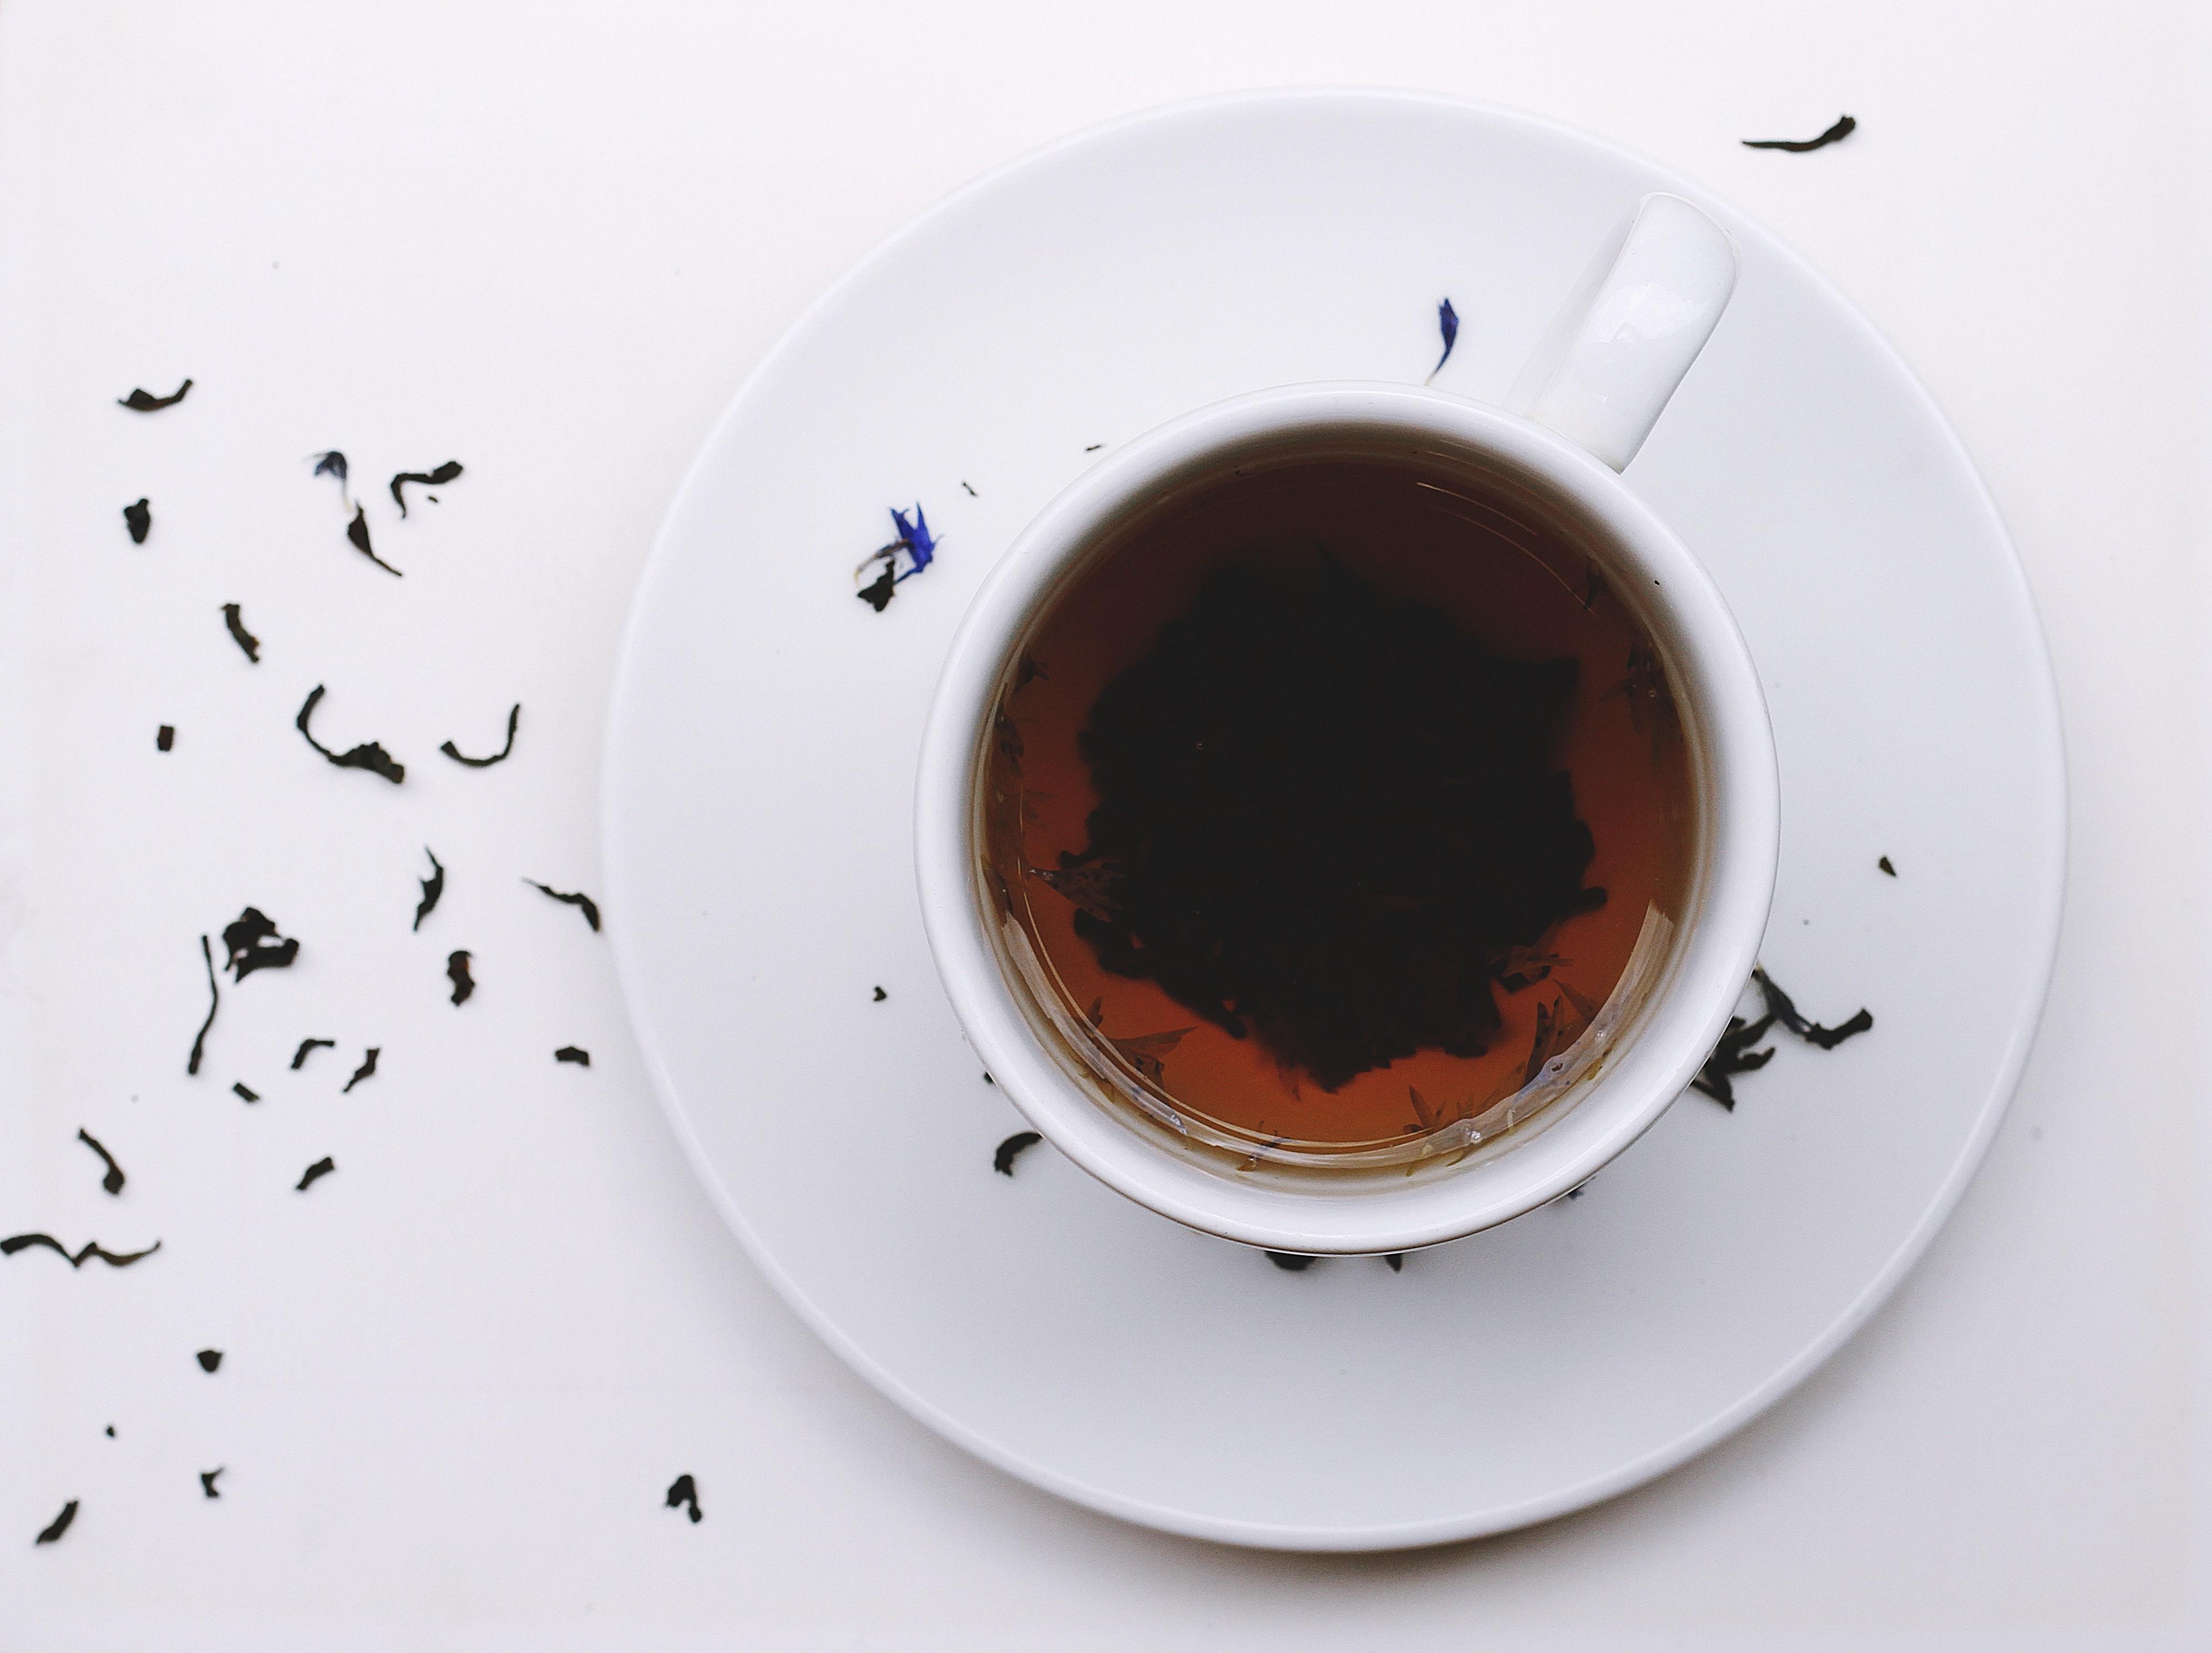 SImple teawares make for better reading (Image credit: Toa Heftiba